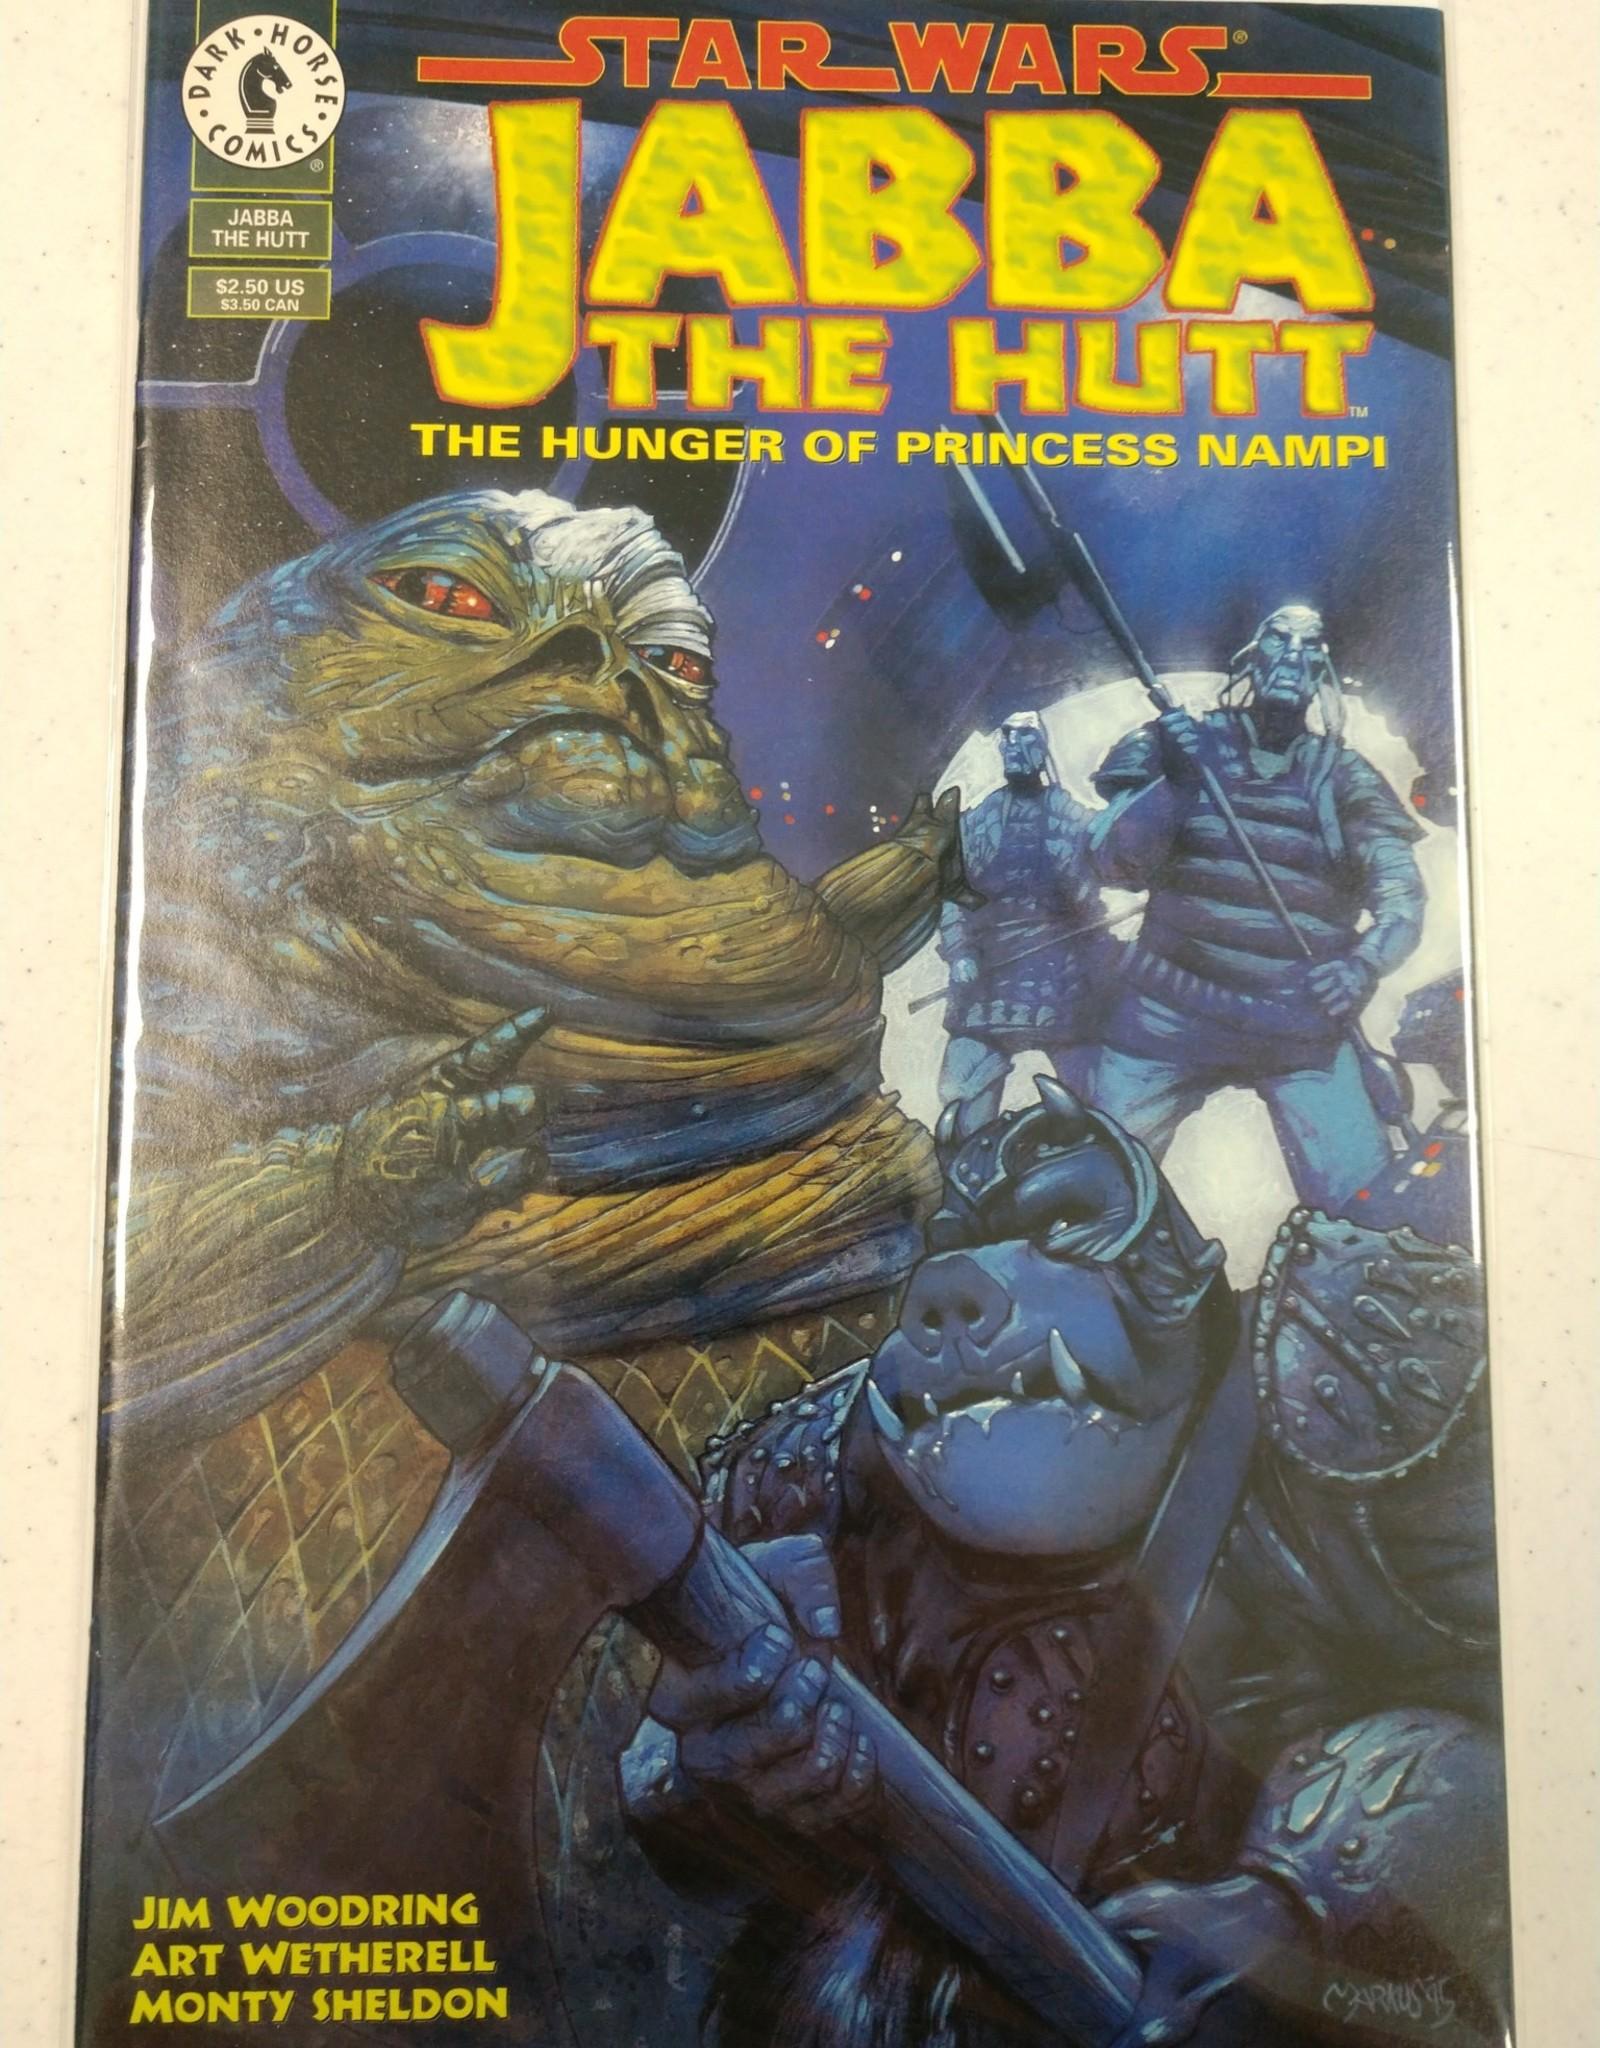 DARK HORSE COMICS Jabba The Hutt The Hunger of Princess Nampi